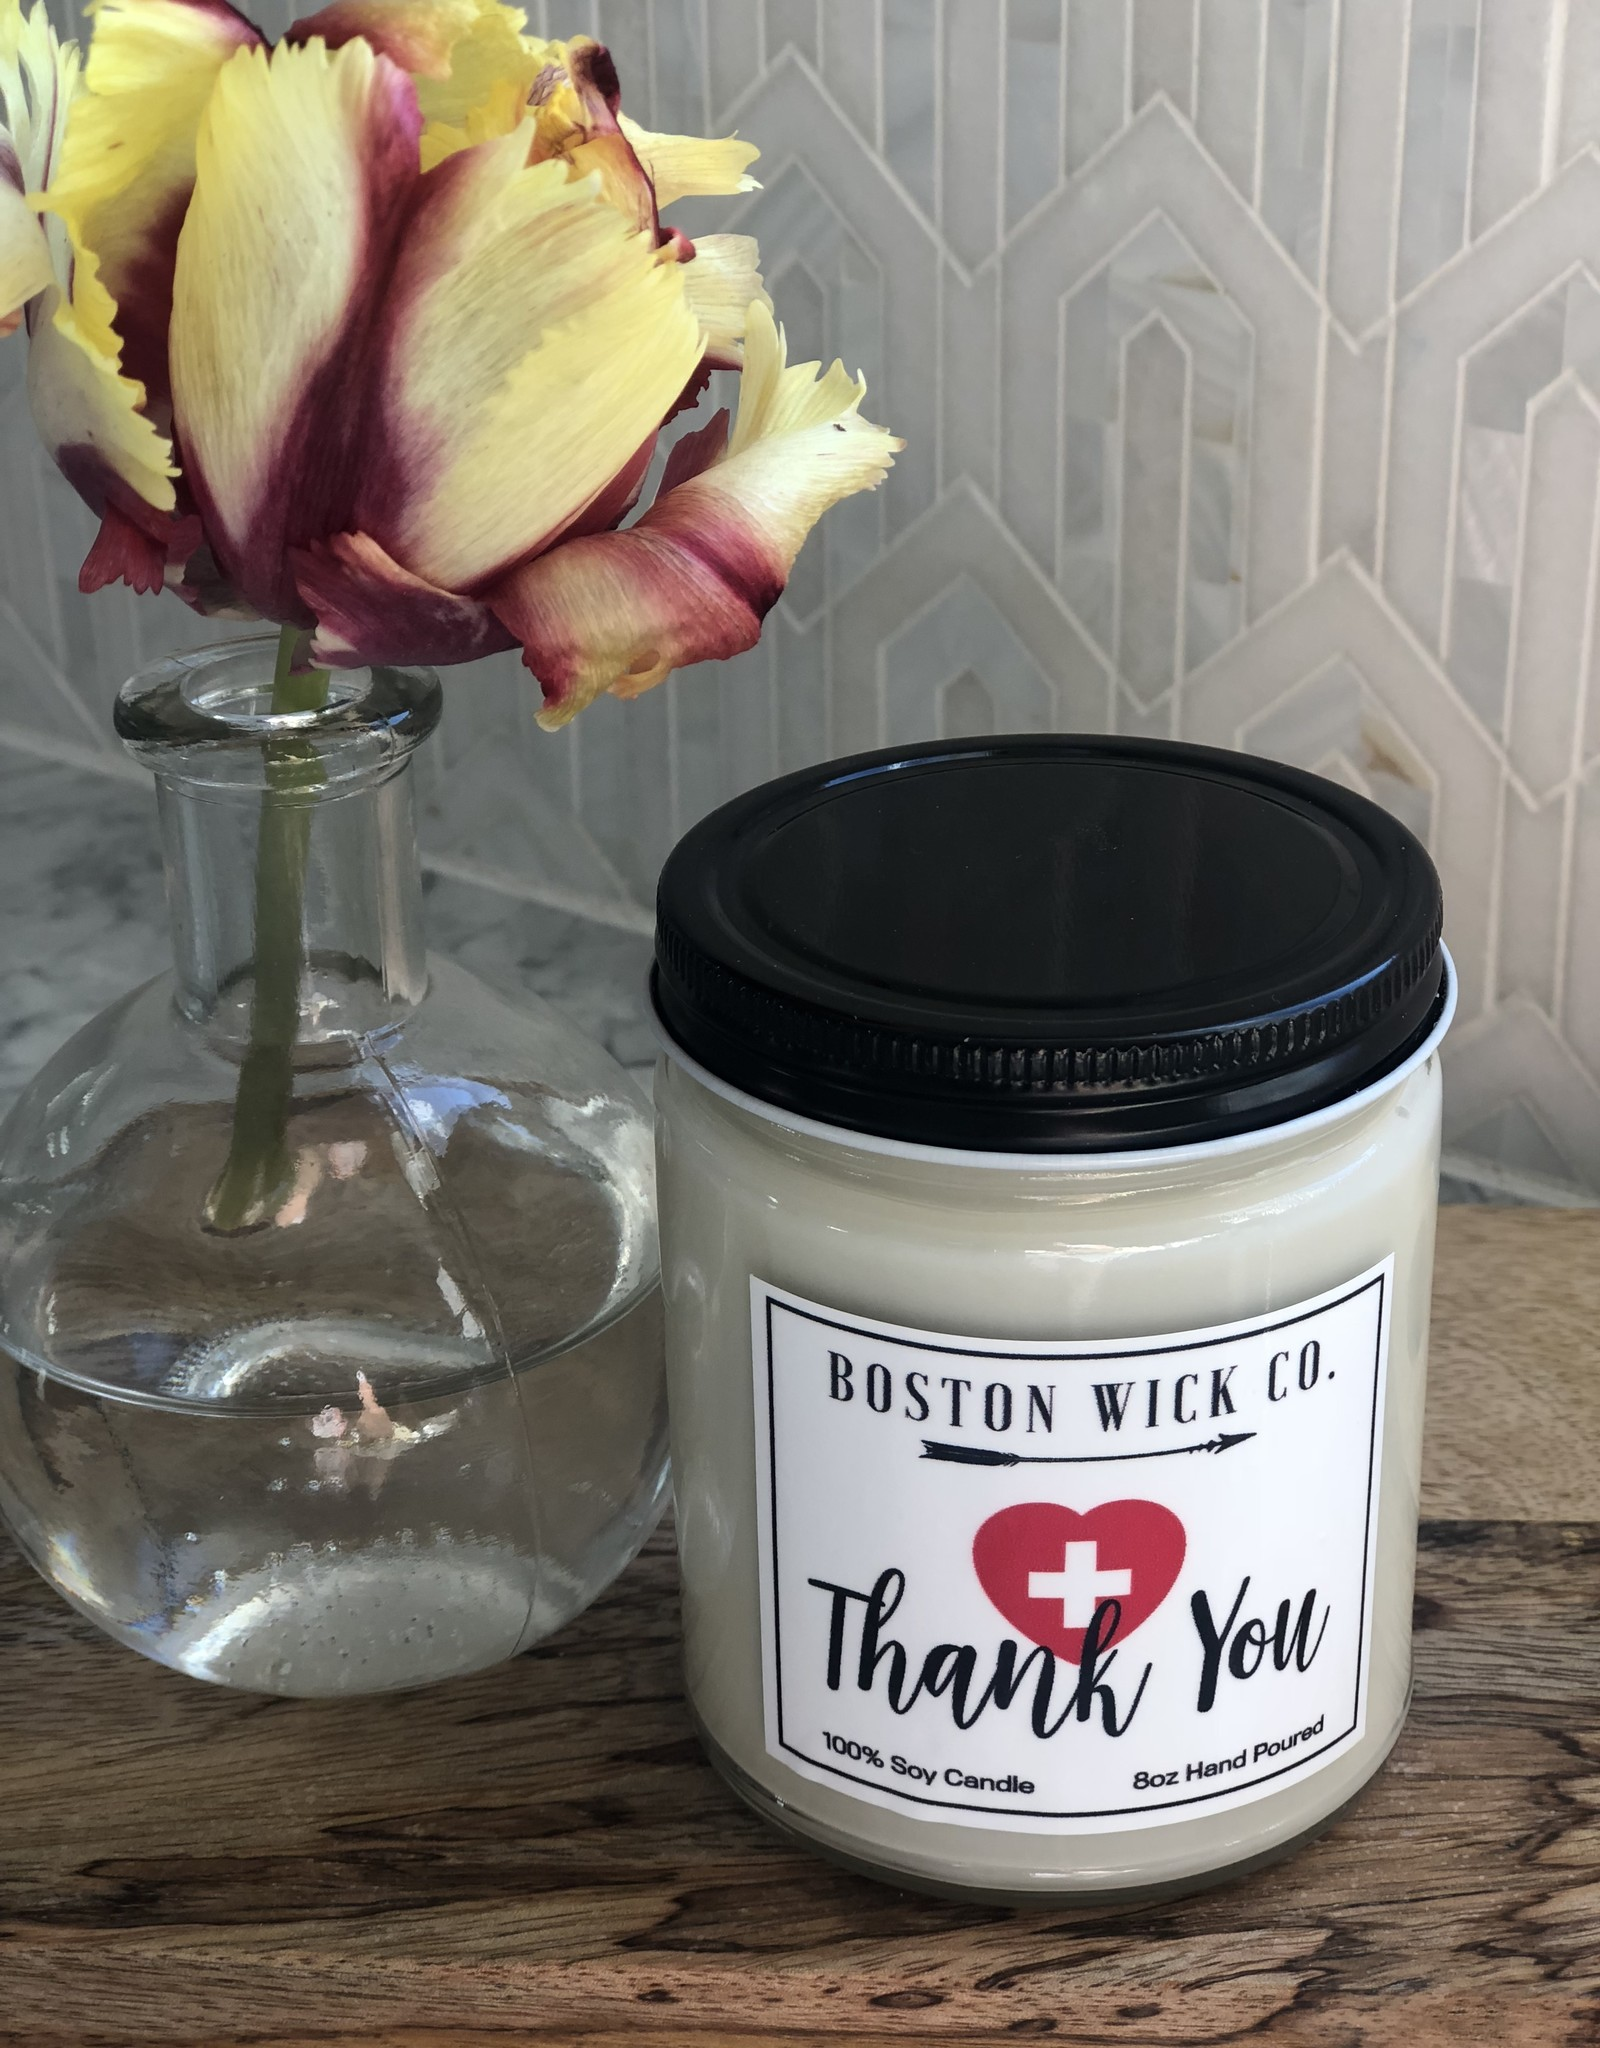 Boston Wick Boston Wick Company - Thank You Medical